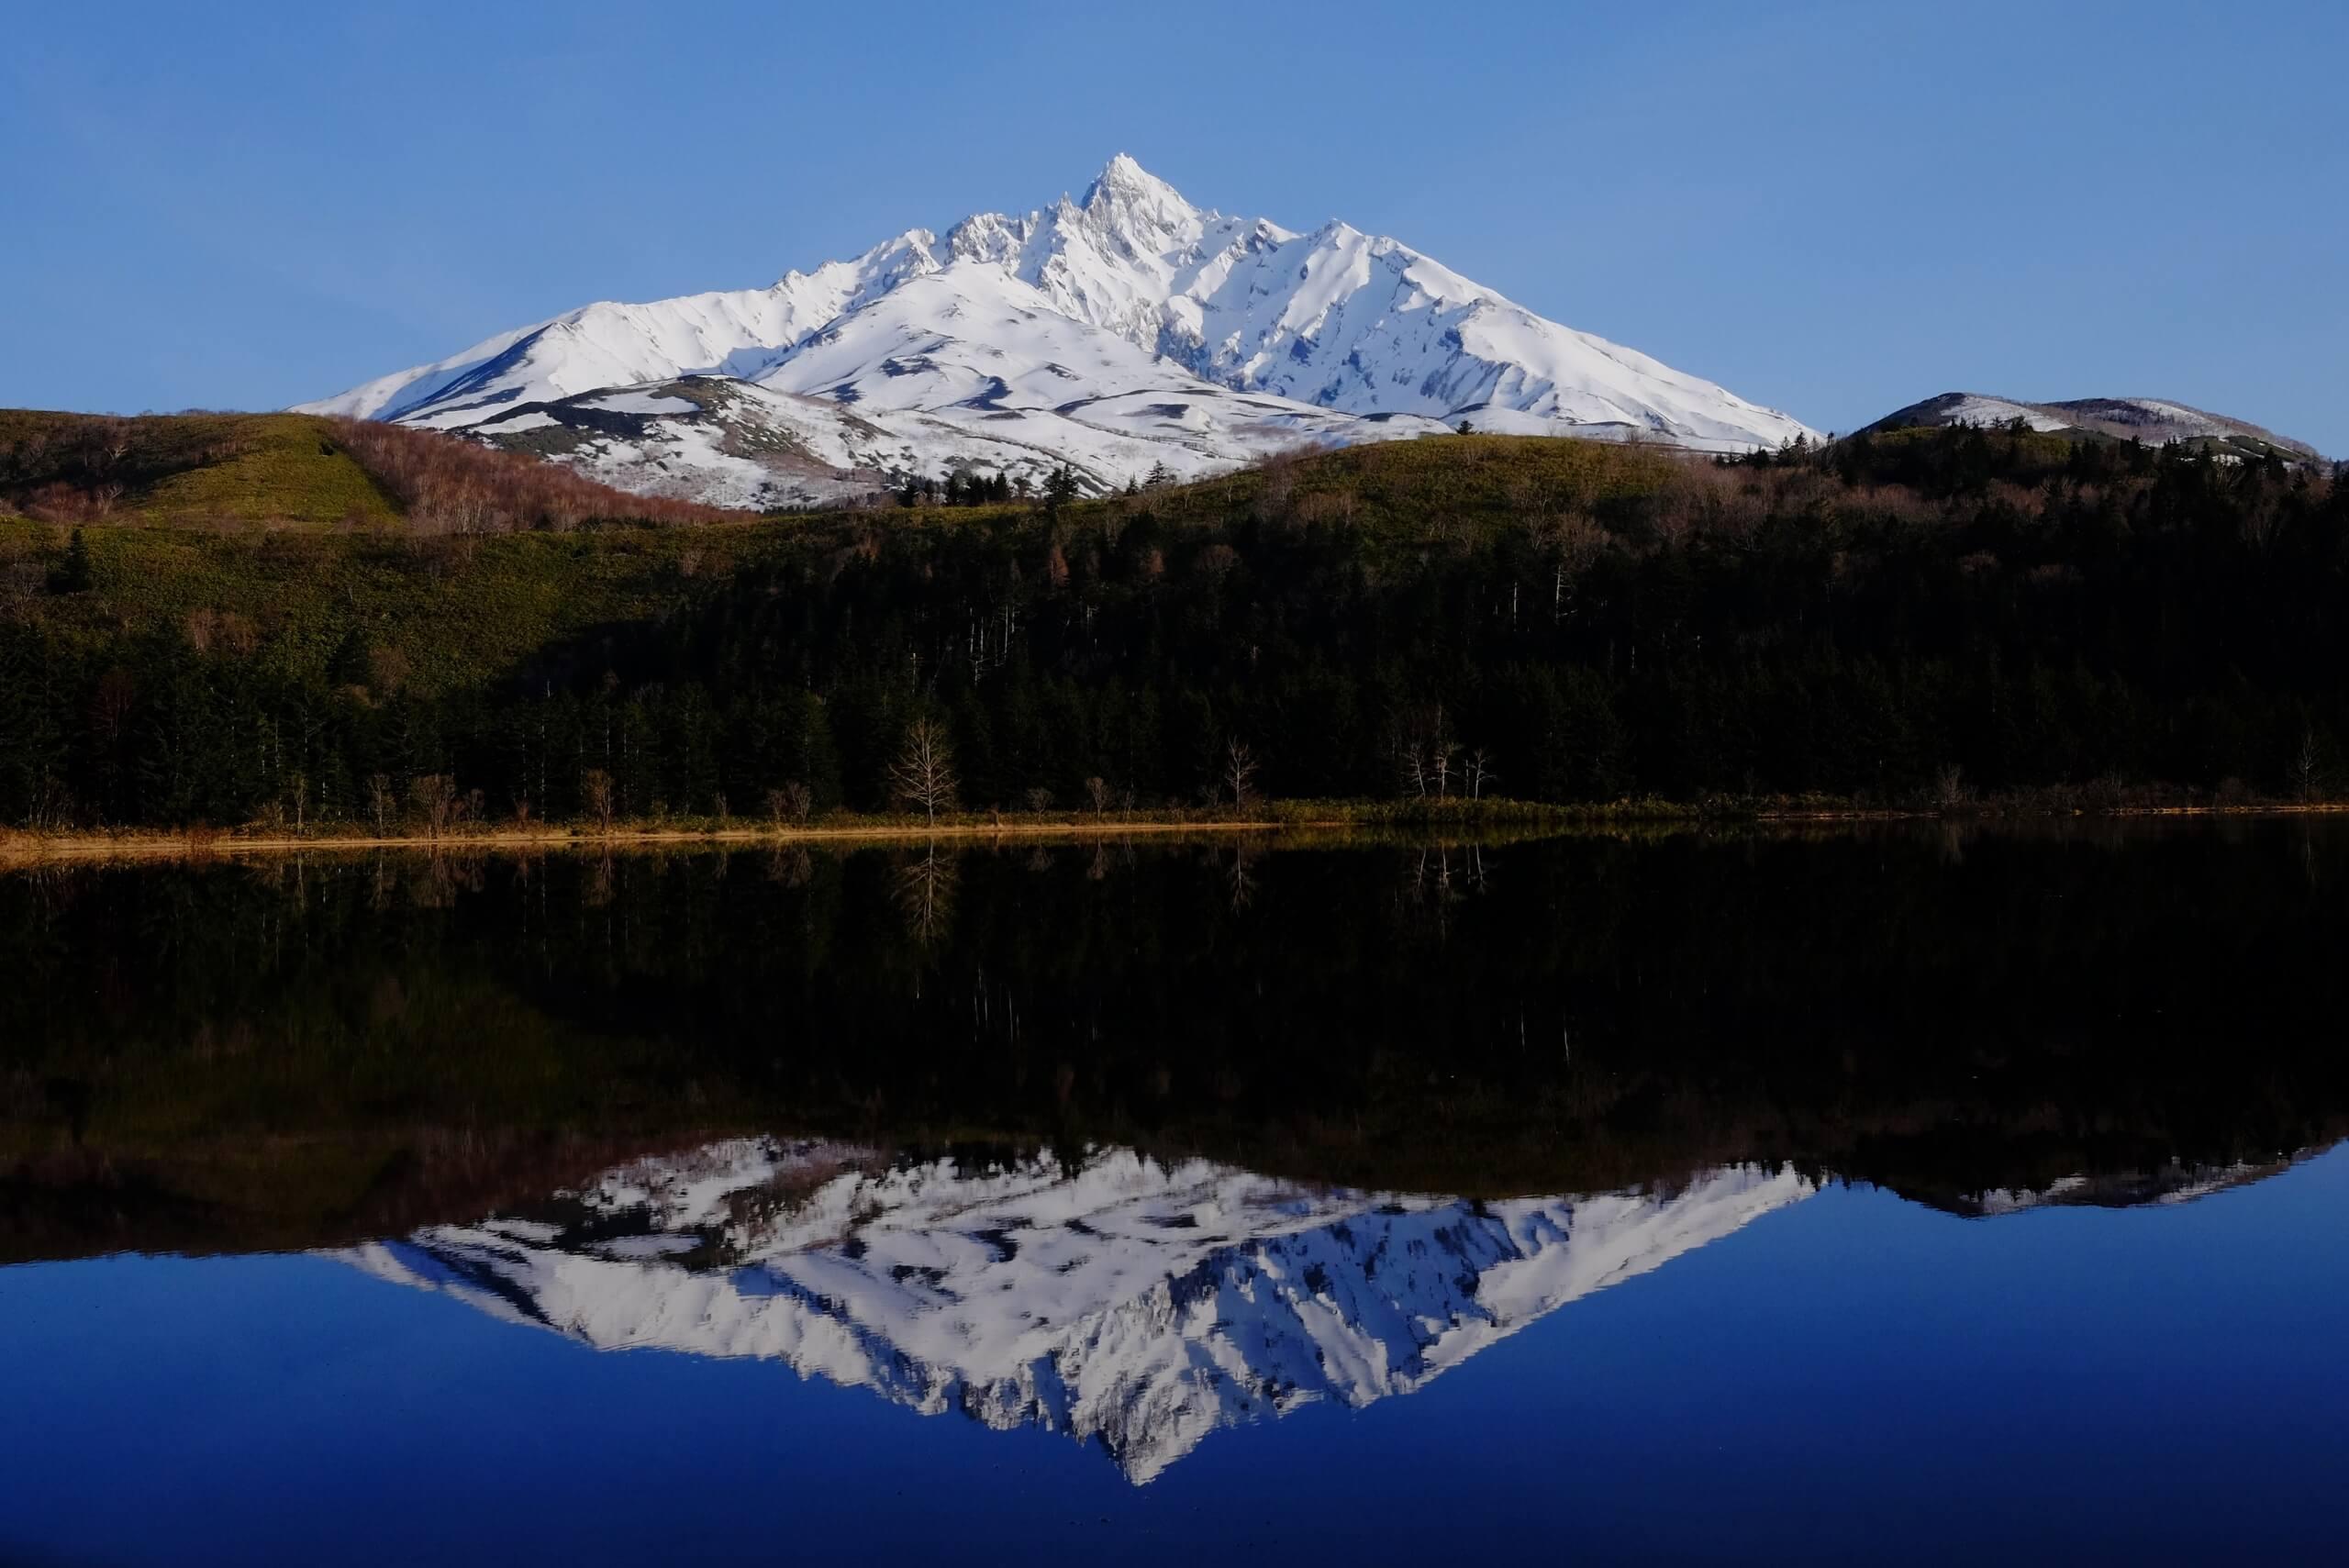 Otatomari沼:一覽湖泊與利尻山美景